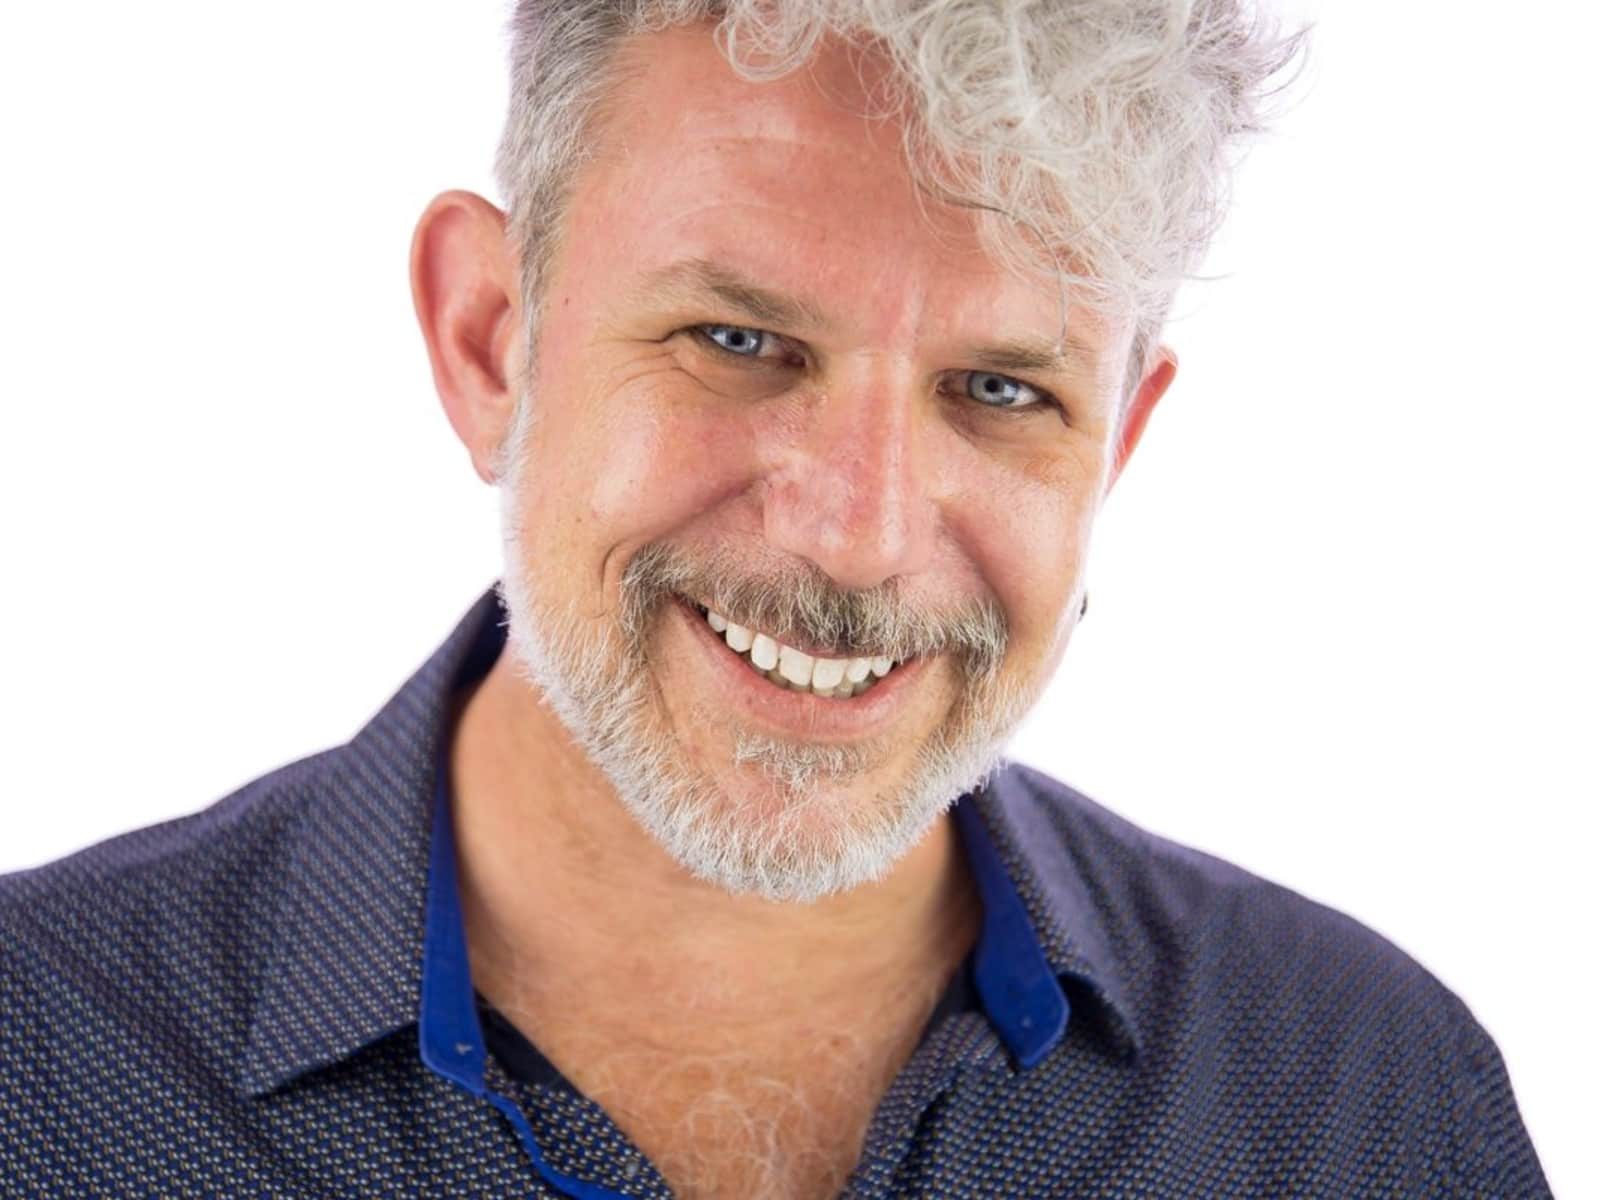 John from Gold Coast, Queensland, Australia